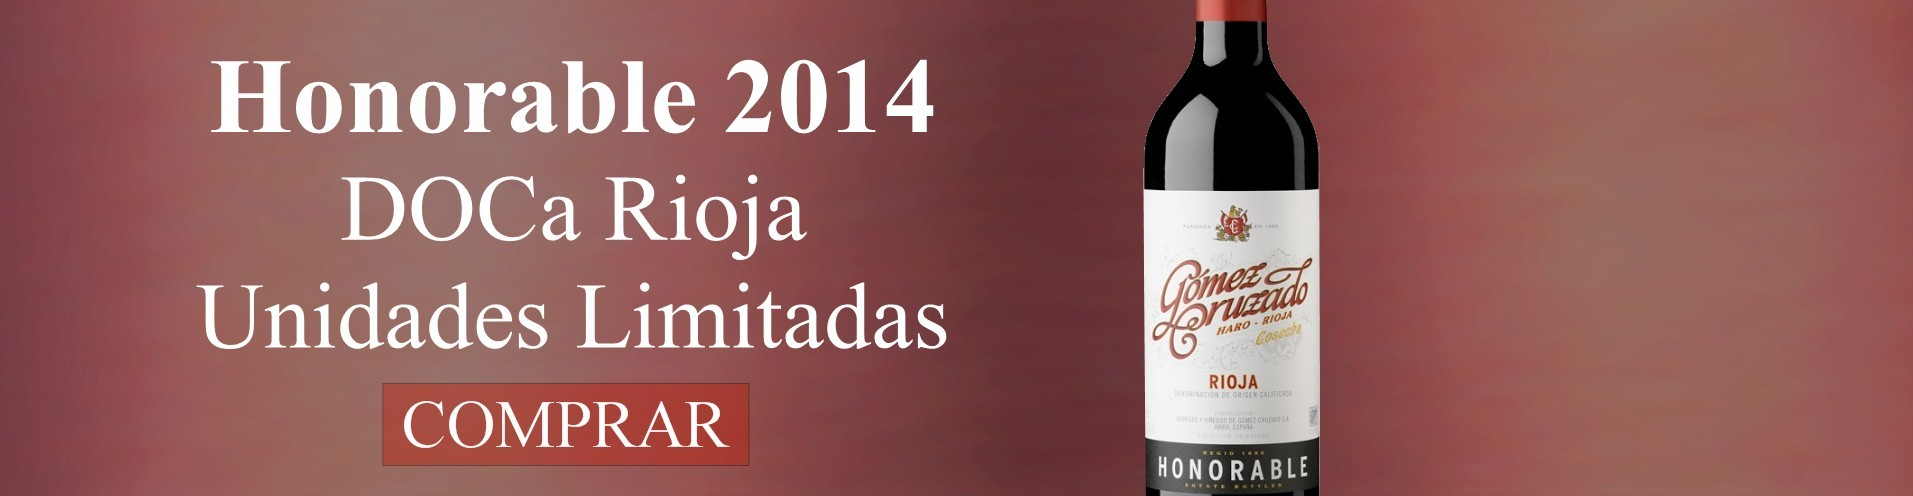 Goméz Cruzado Honorable 2014 - Vino Tinto - DOCa Rioja